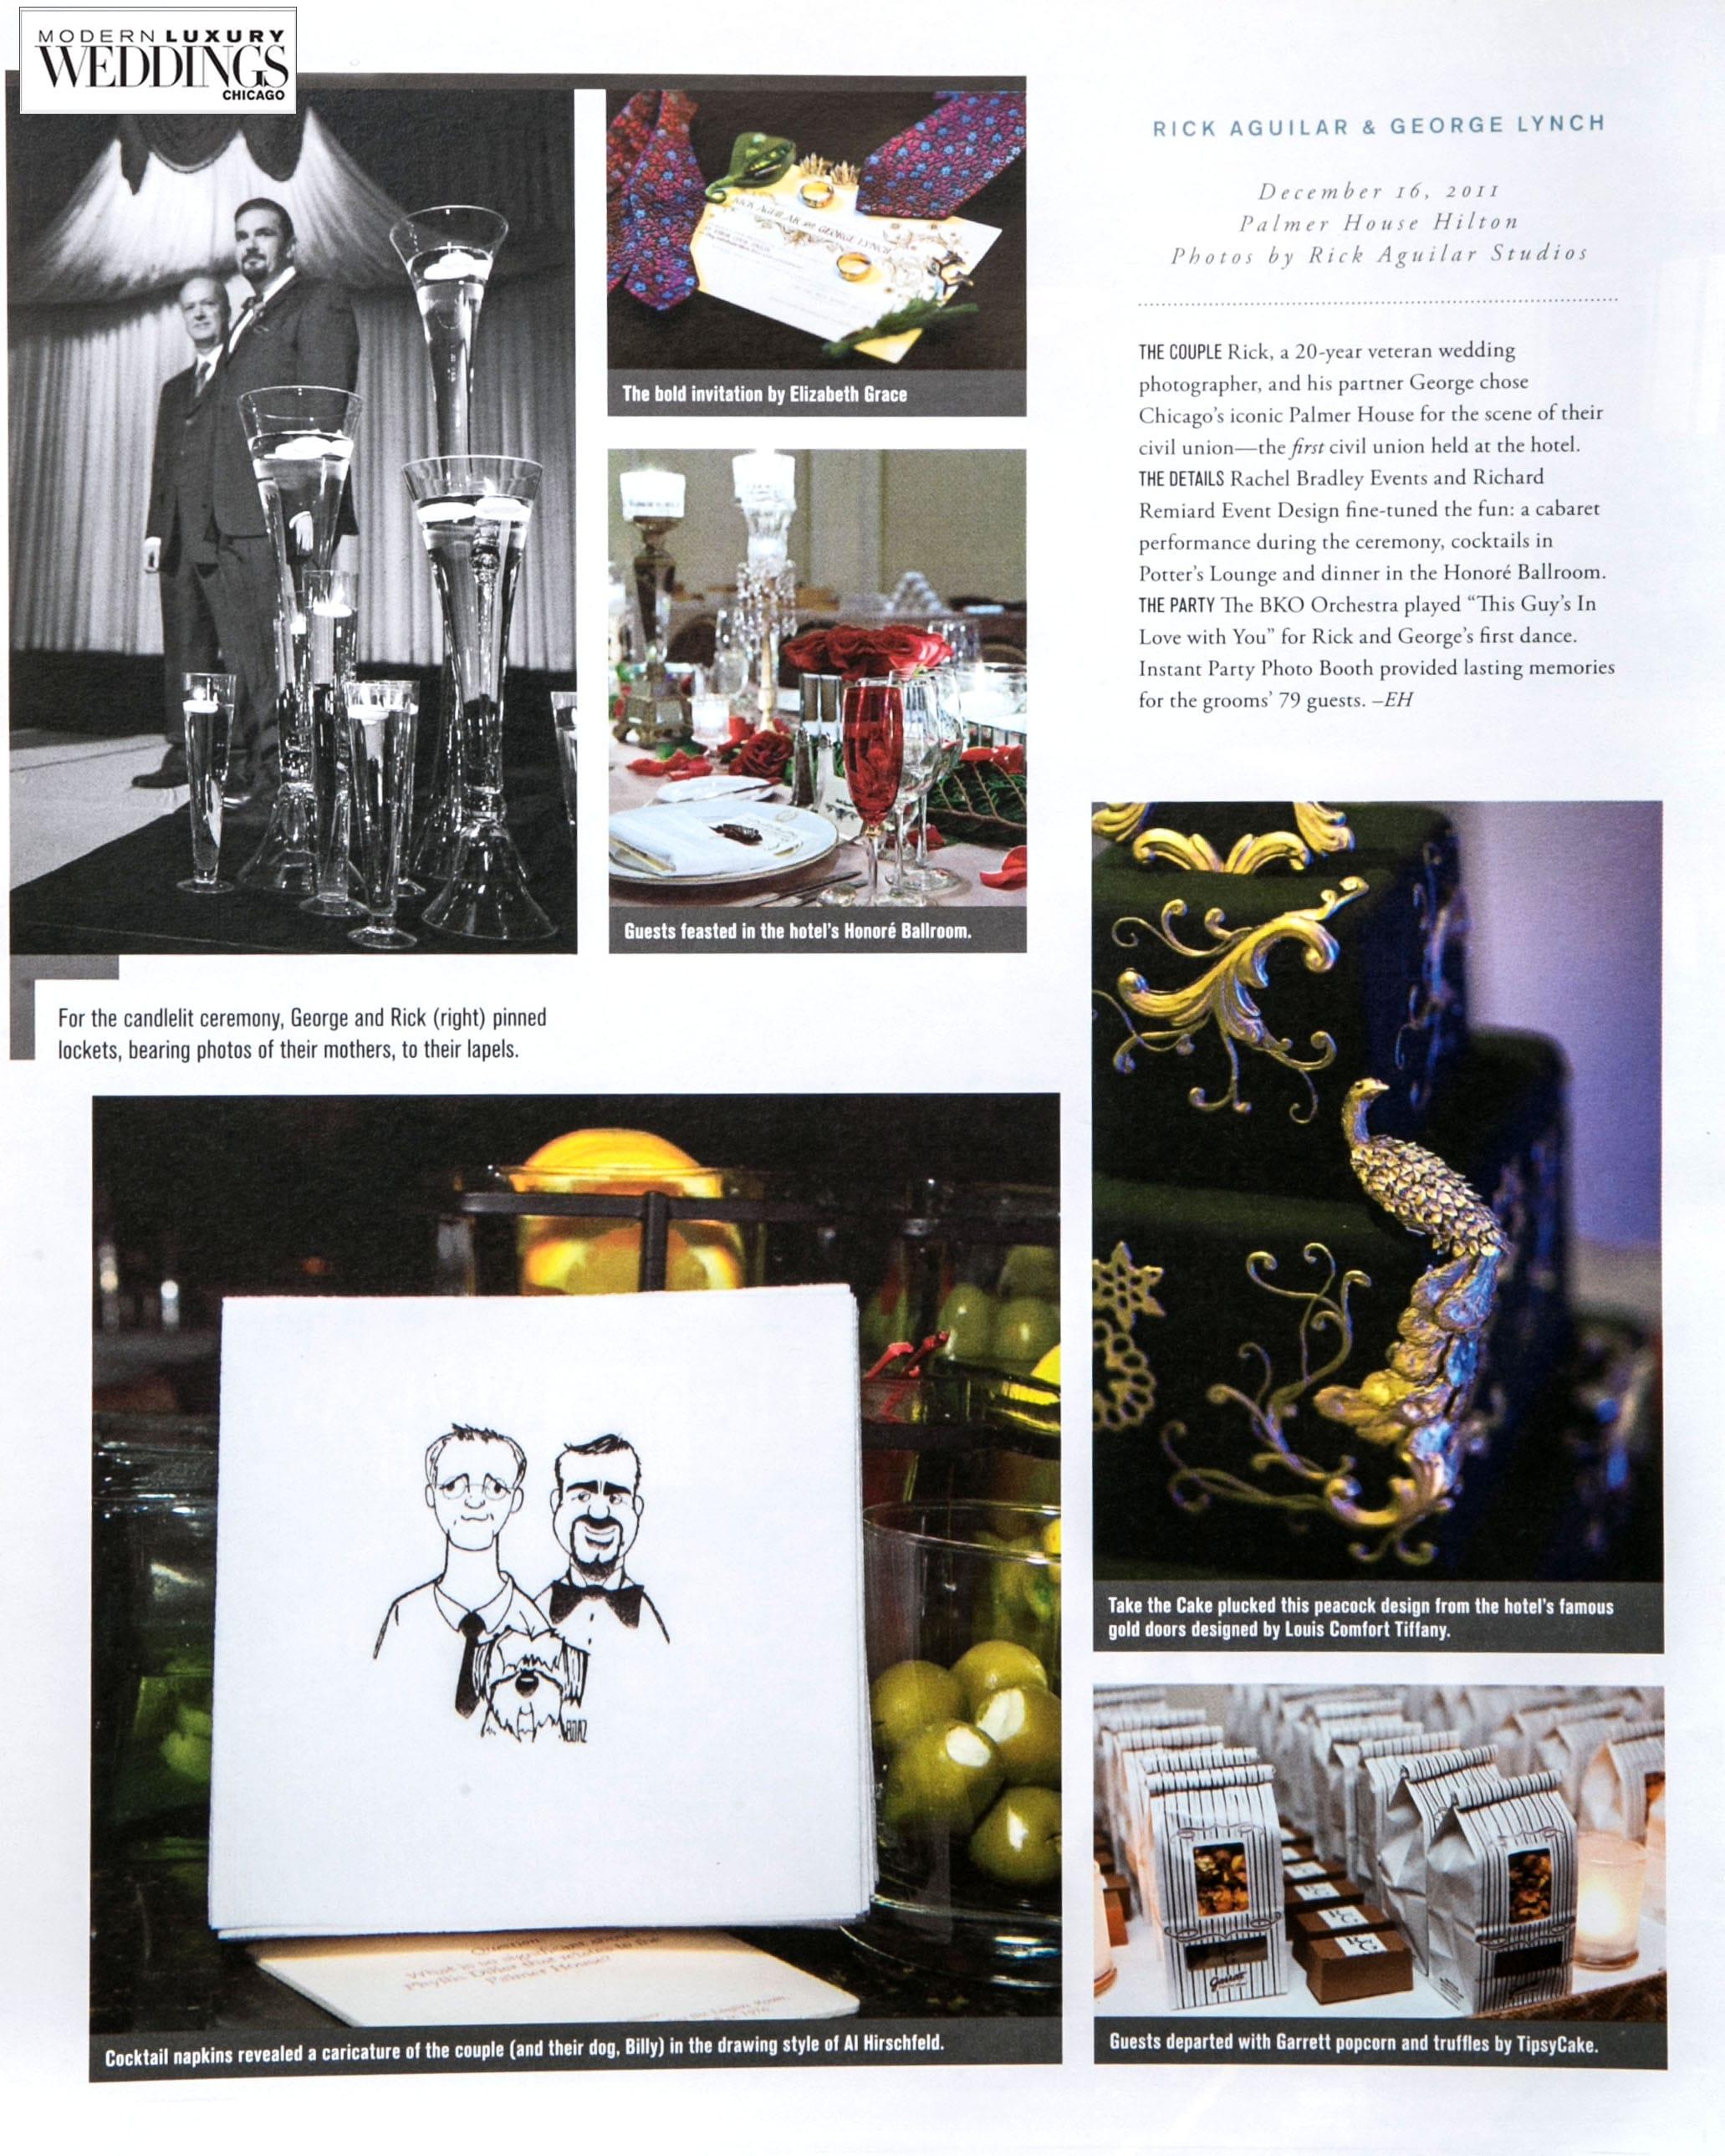 LGBT Real Wedding published in Wedding Magazine